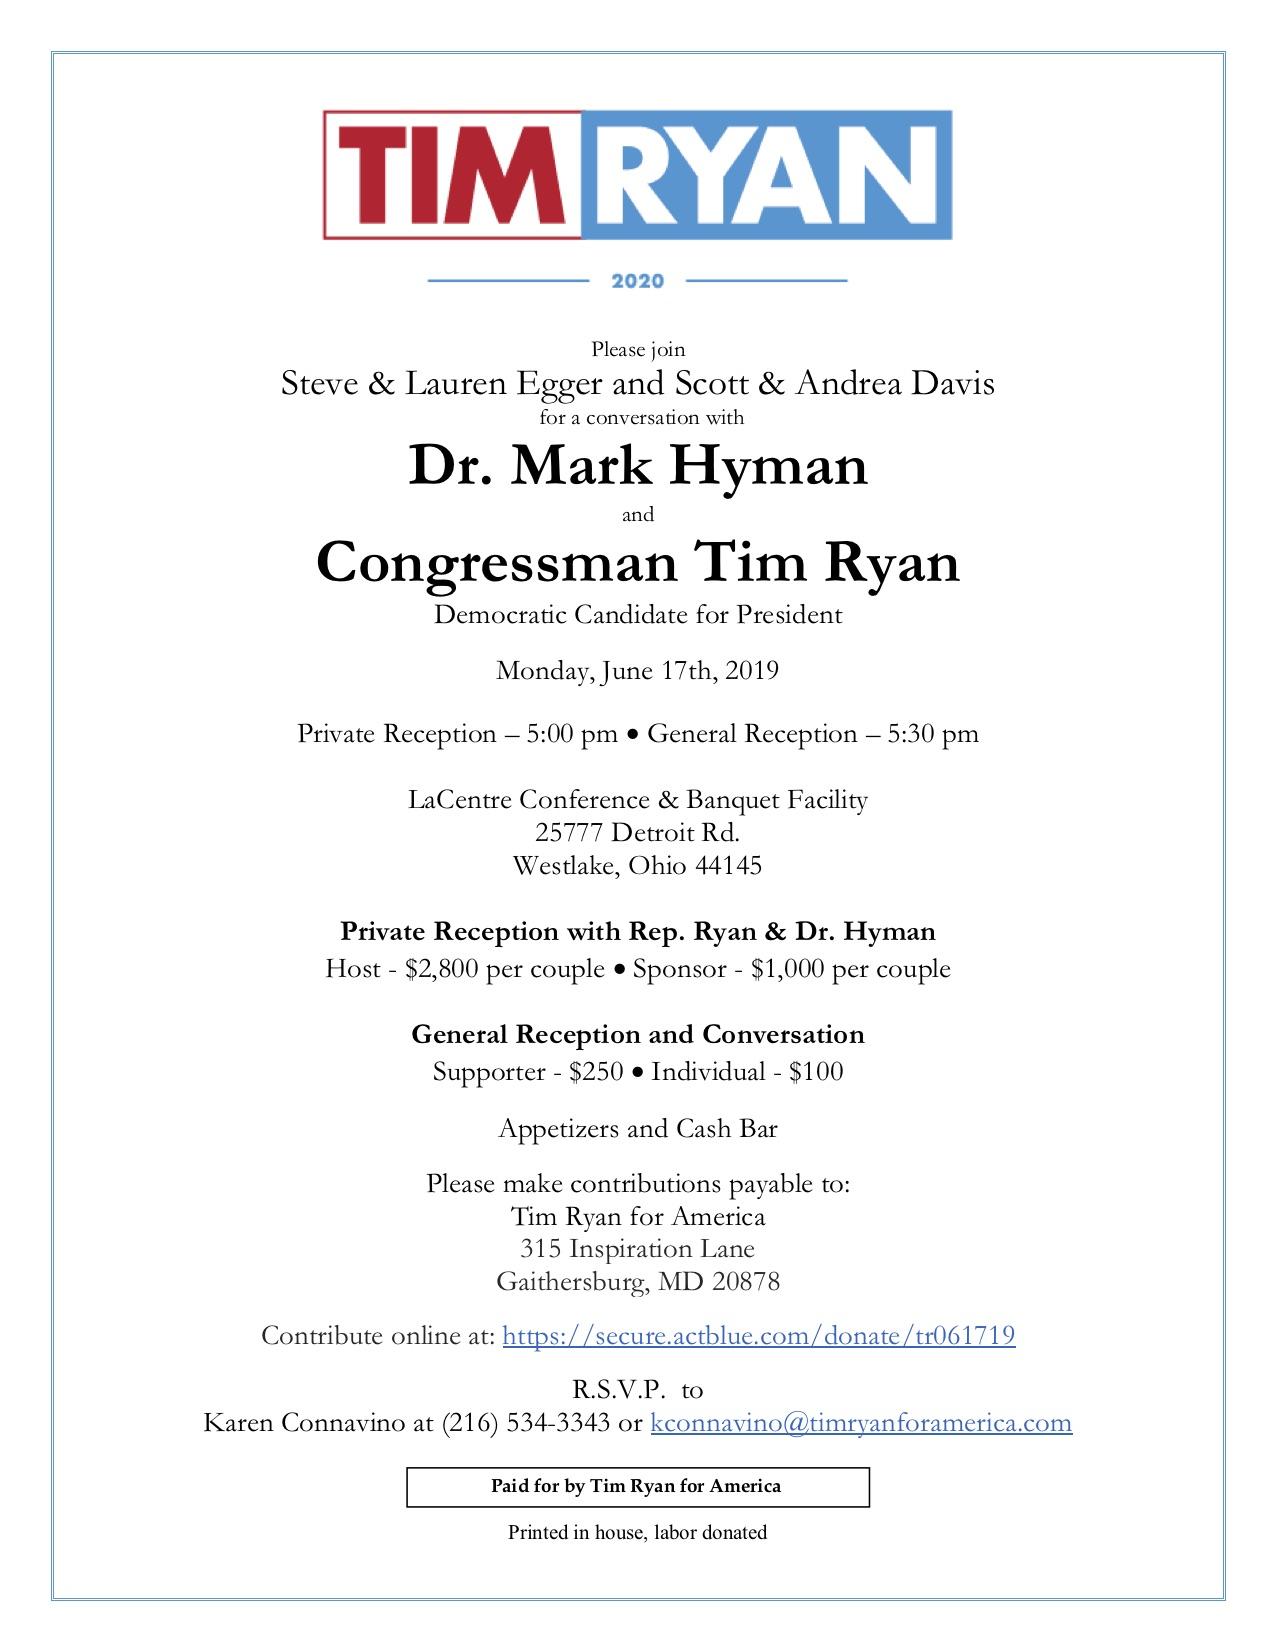 6.17.19 Dr. Hyman.jpg